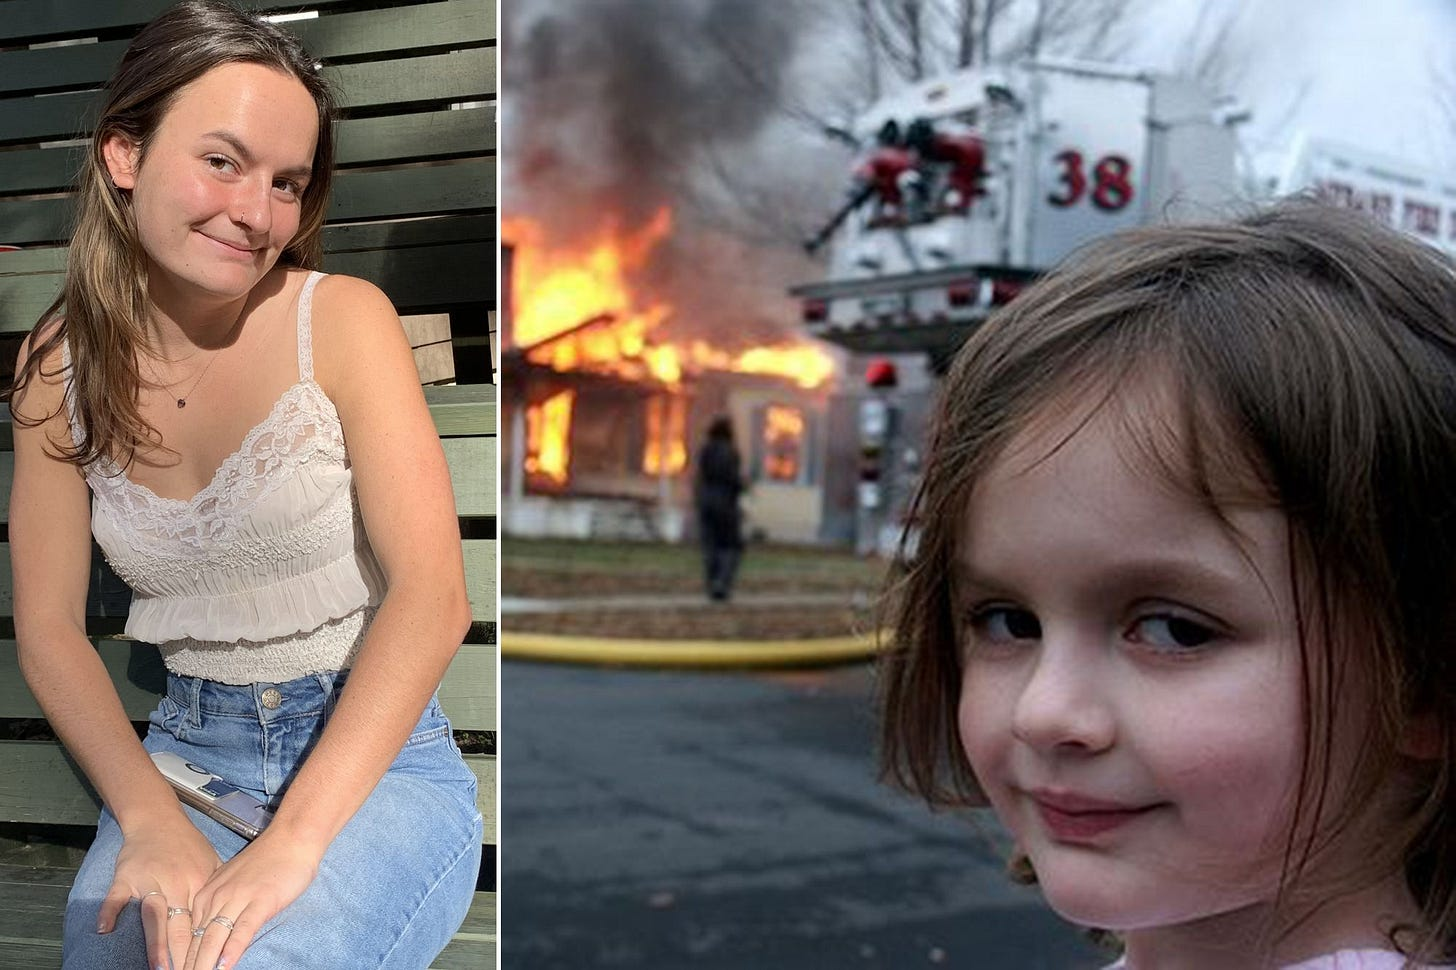 Disaster Girl' selling original photo behind viral meme